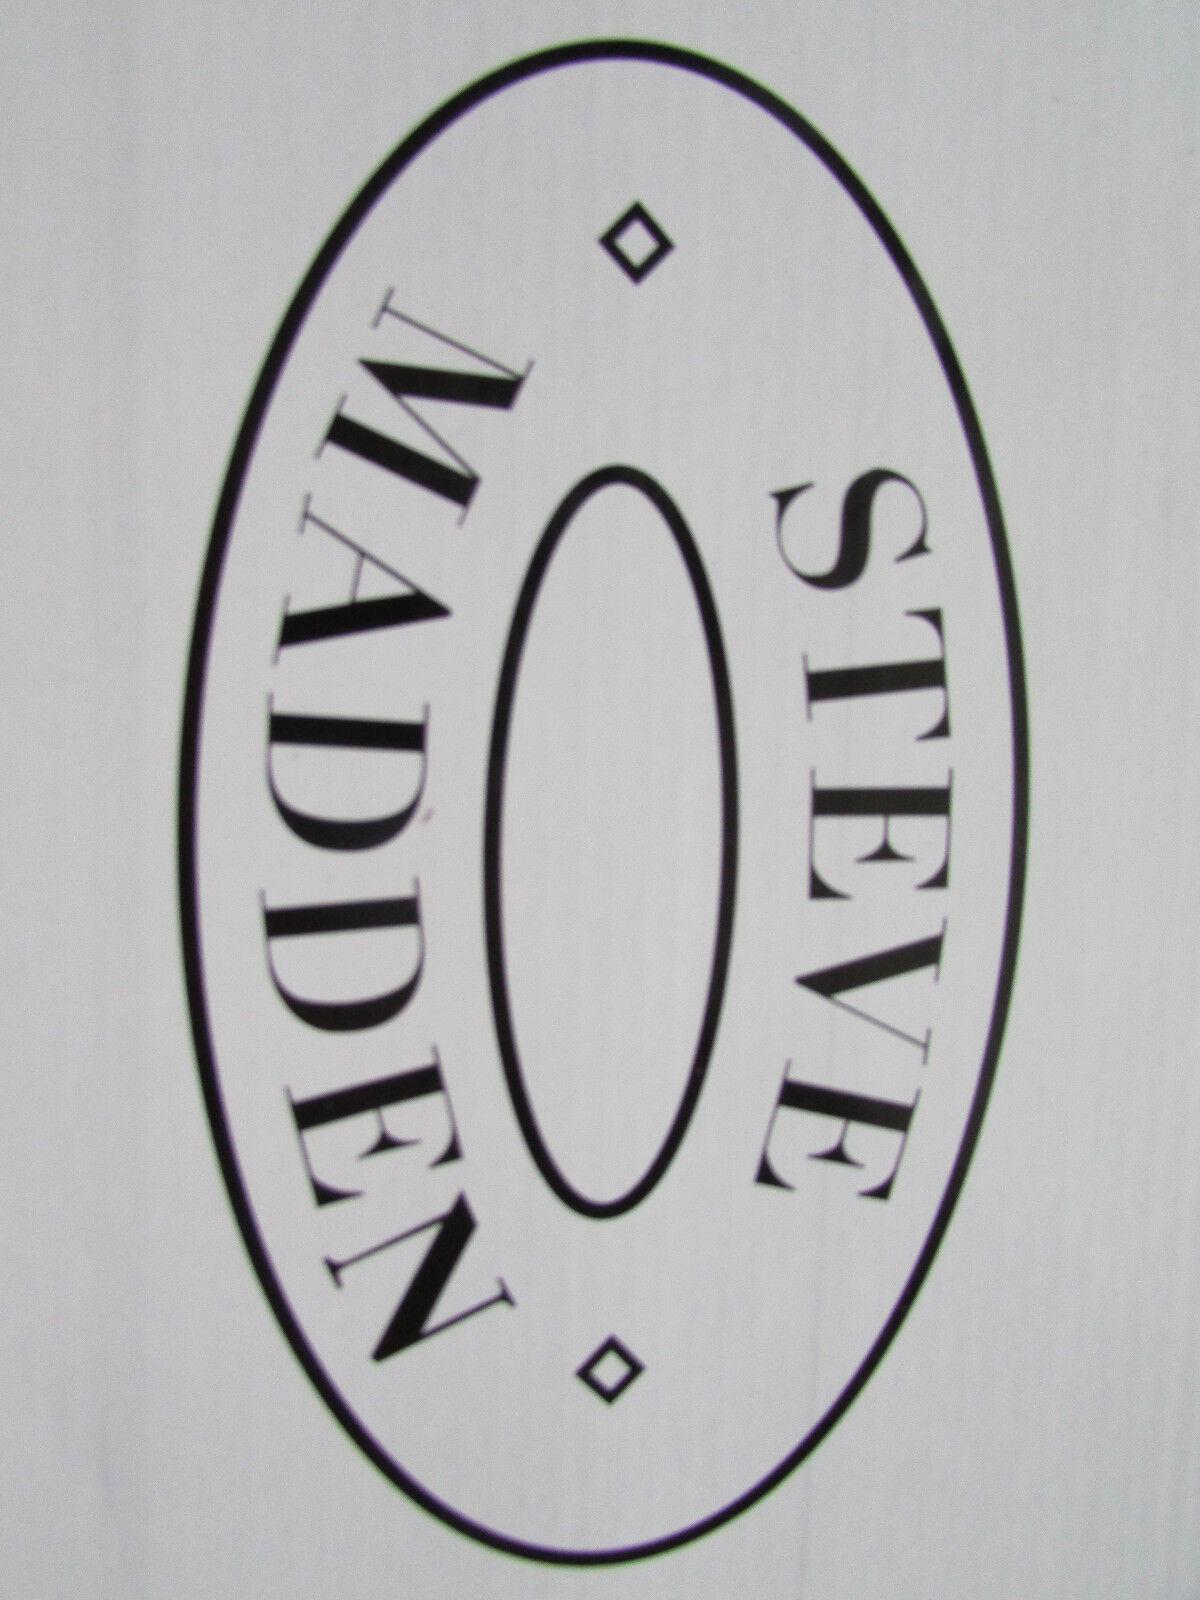 NEW STEVE MADDEN FLYYNN FLYYNN MADDEN GRAY SUEDE CHUKKA BOOTS SNEAKERS BOOT Scarpe Uomo 12 4eeb4f